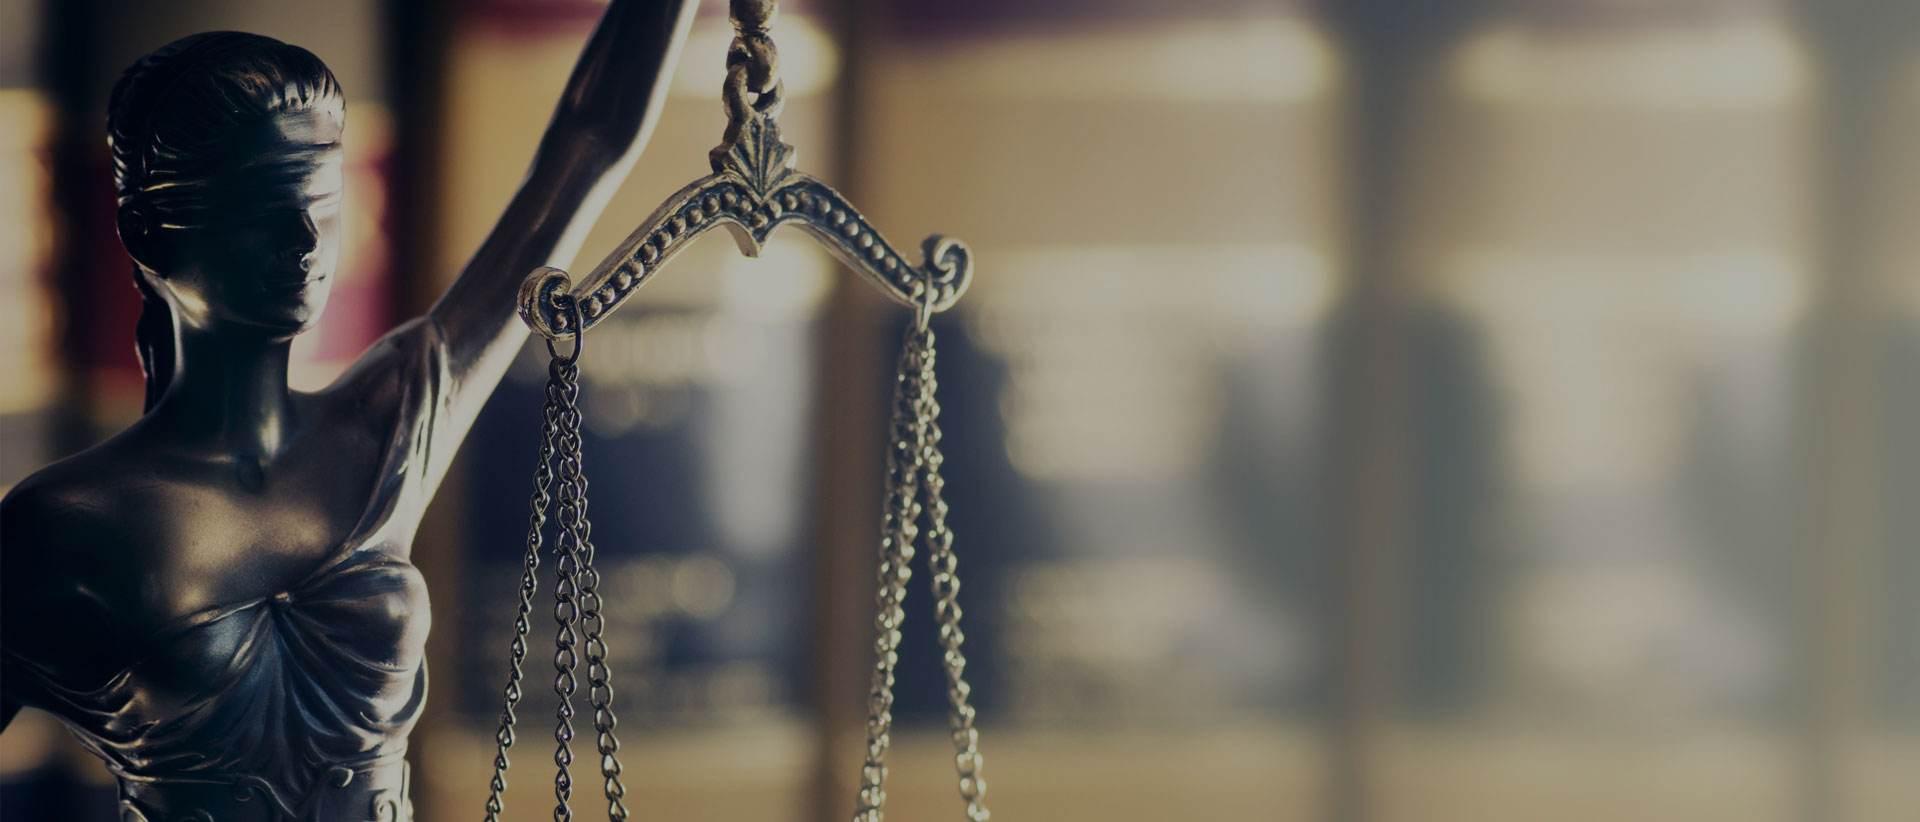 Criminal Justice Reform - SiX